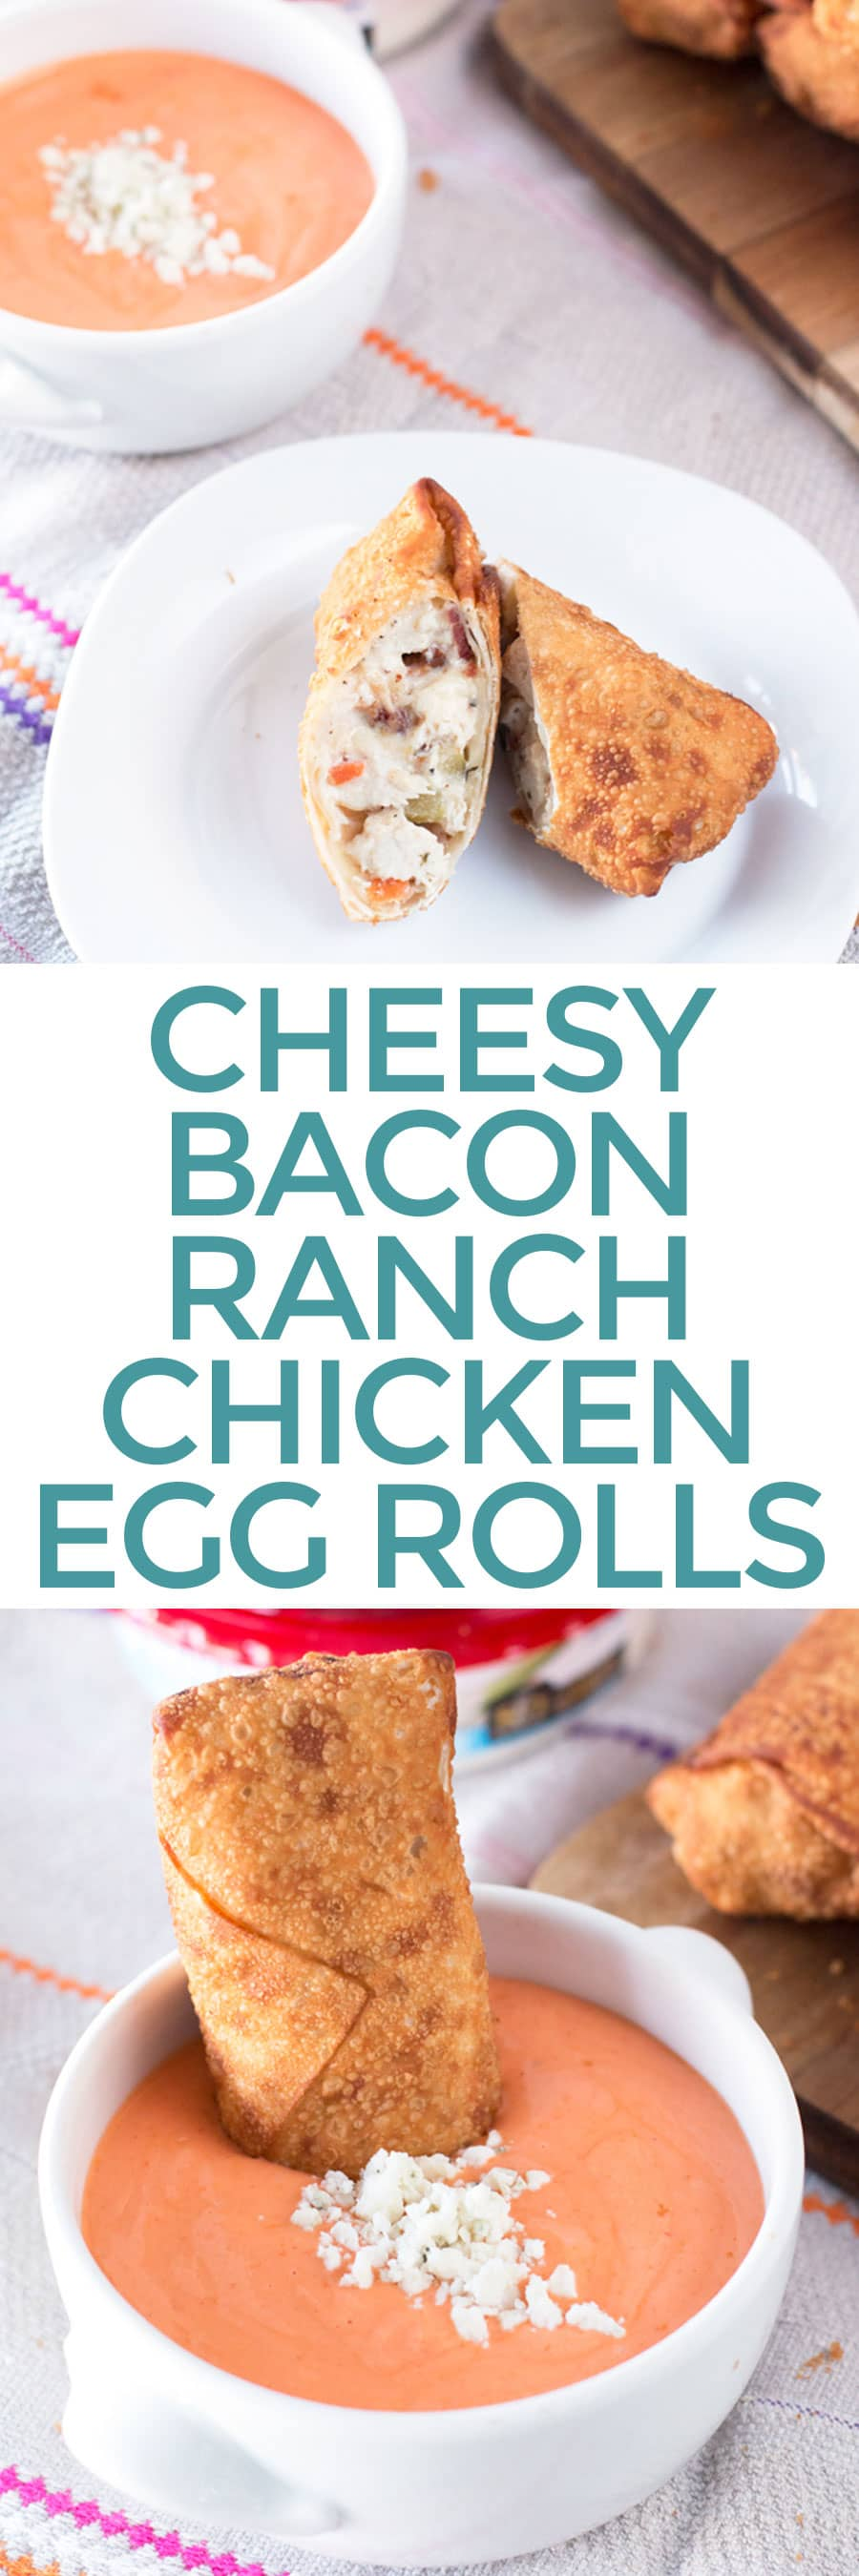 Cheesy Bacon Ranch Chicken Egg Rolls  | cakenknife.com